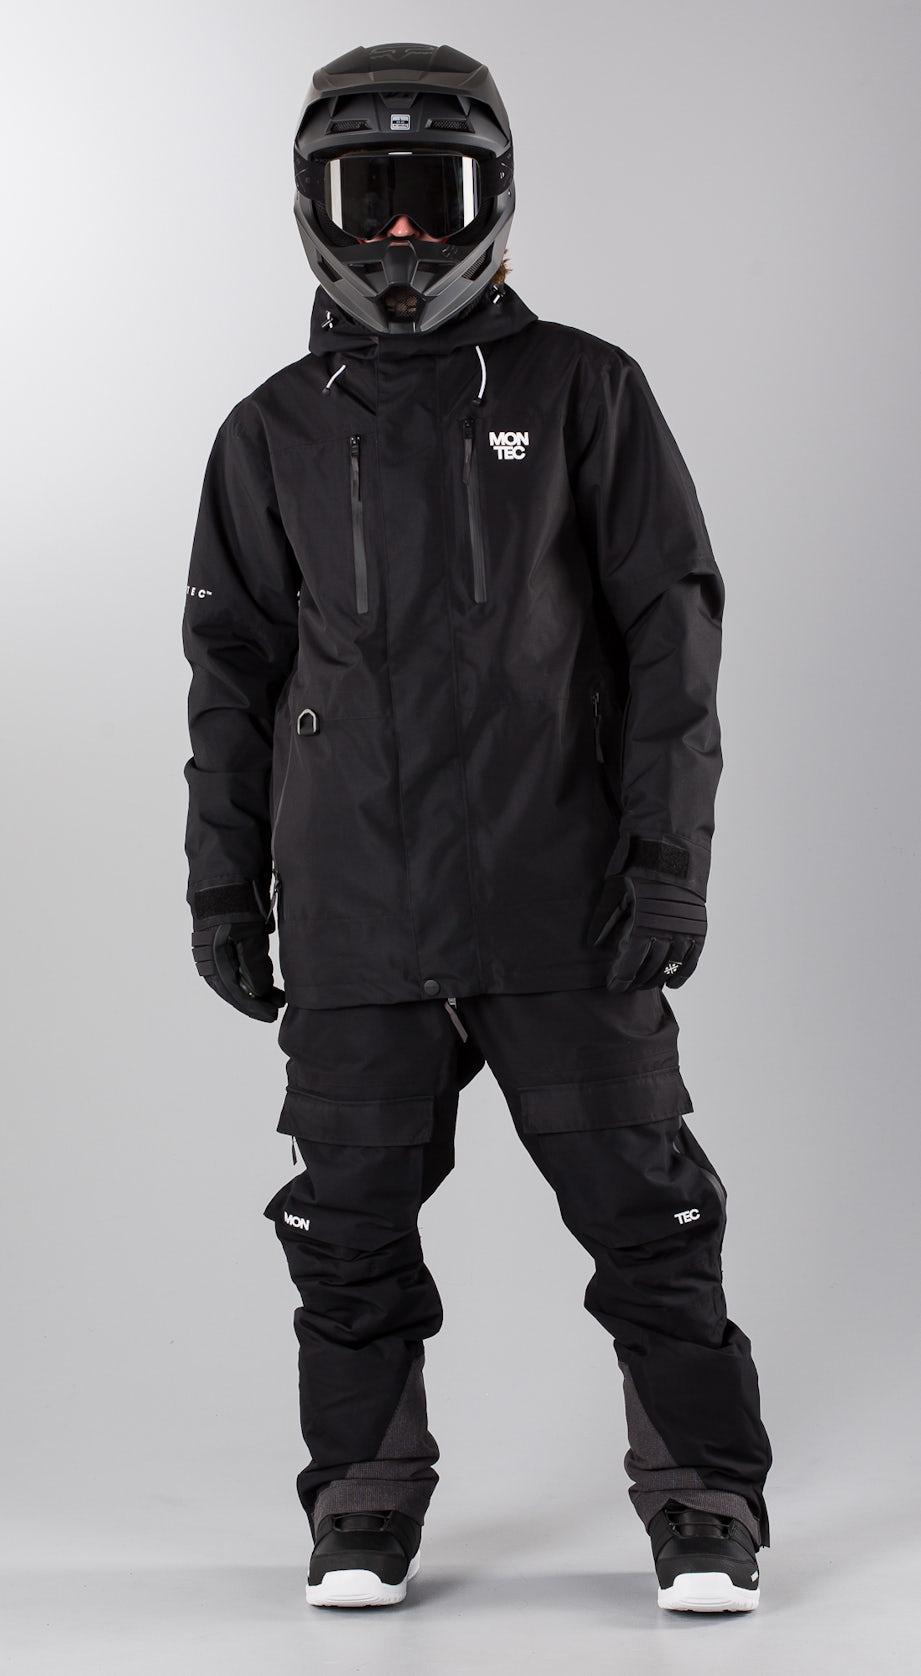 Montec Fawk Black Snowmobile clothing Multi